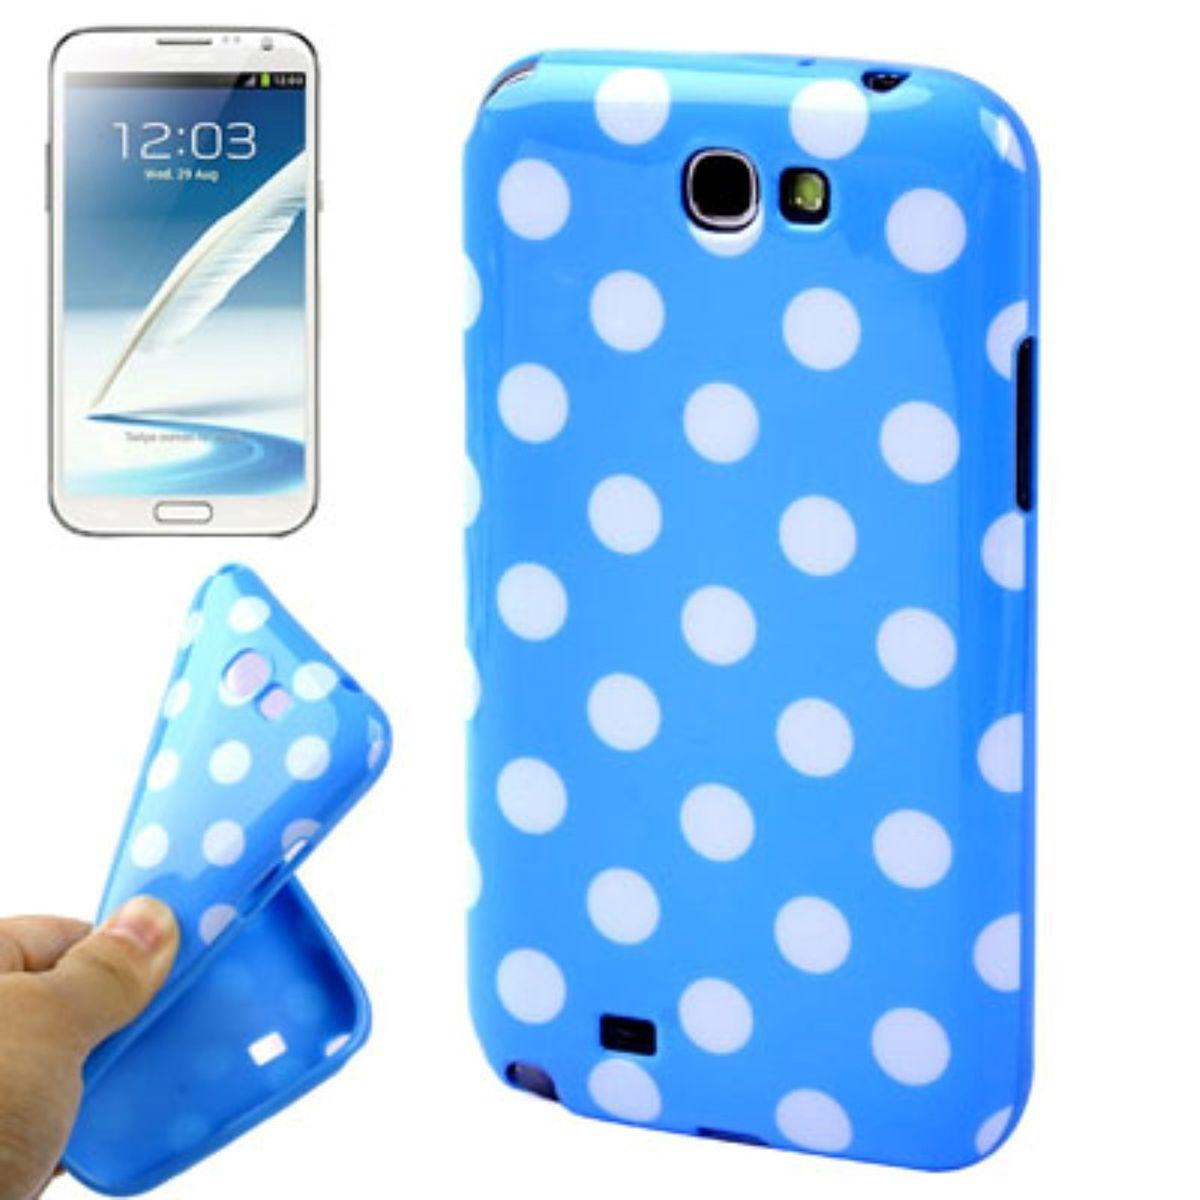 Schutzhülle TPU Case für Handy Samsung Galaxy Note II N7100 Blau